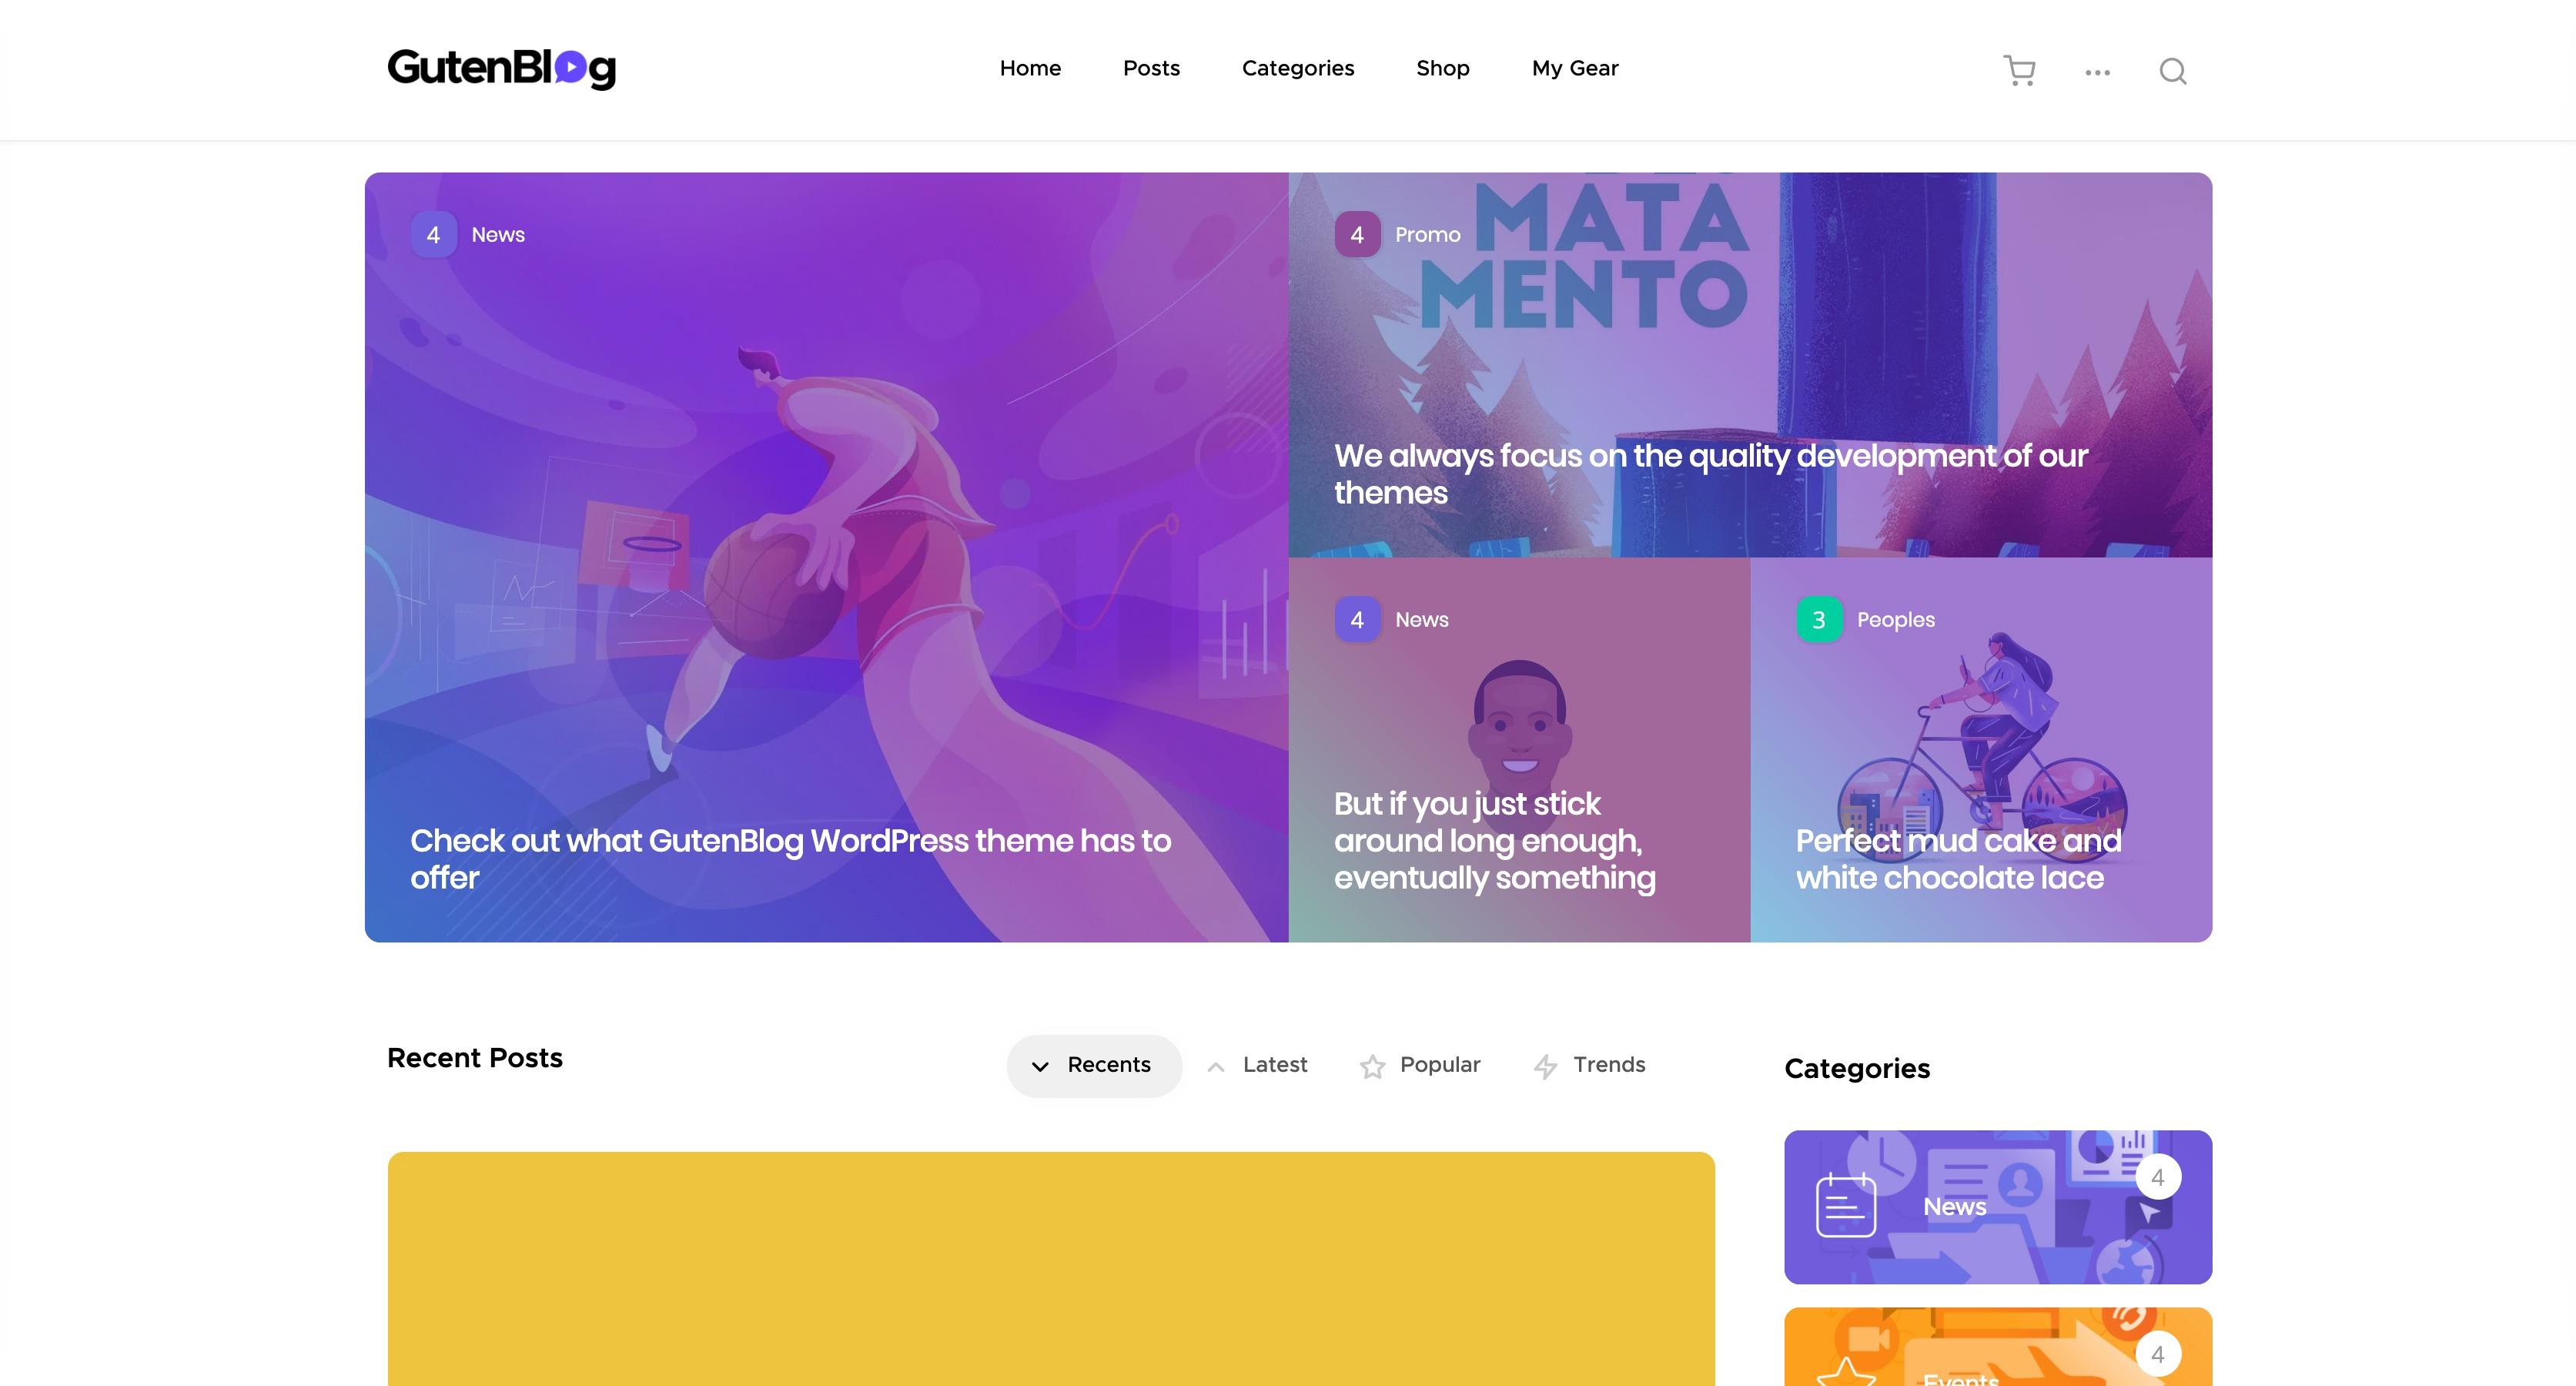 Gutenblog-现代时尚博客模板WordPress主题